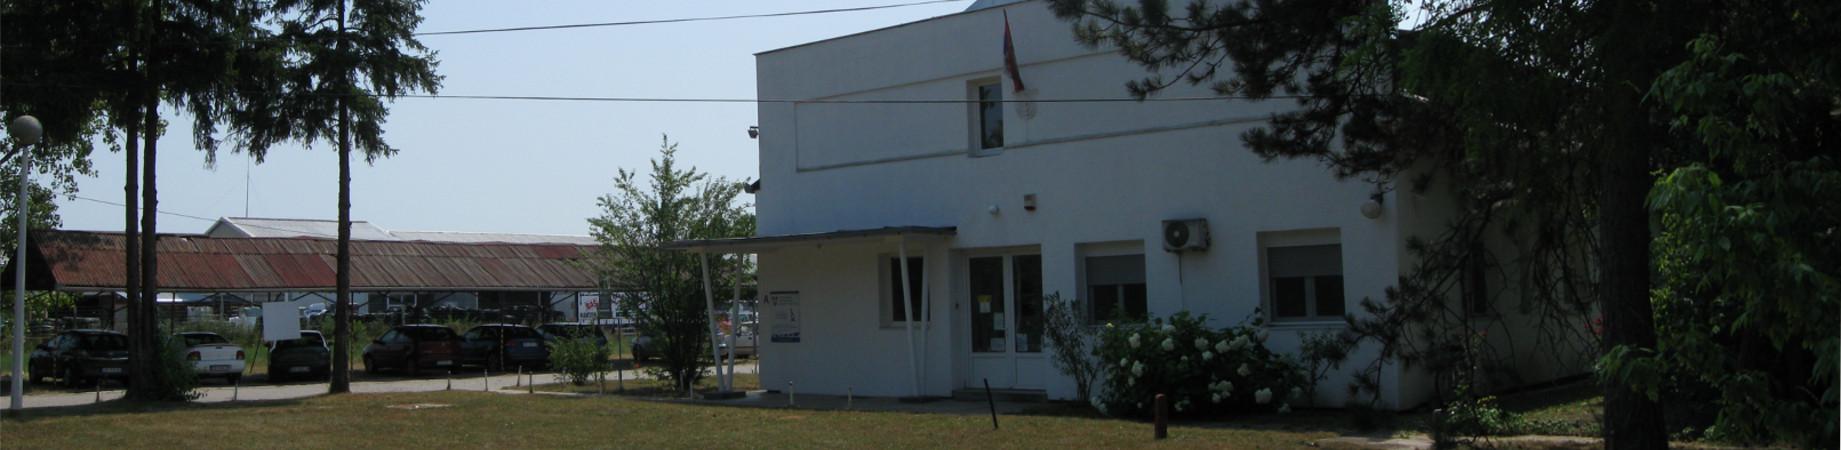 "Veterinarski specijalistički institut ""Subotica"""